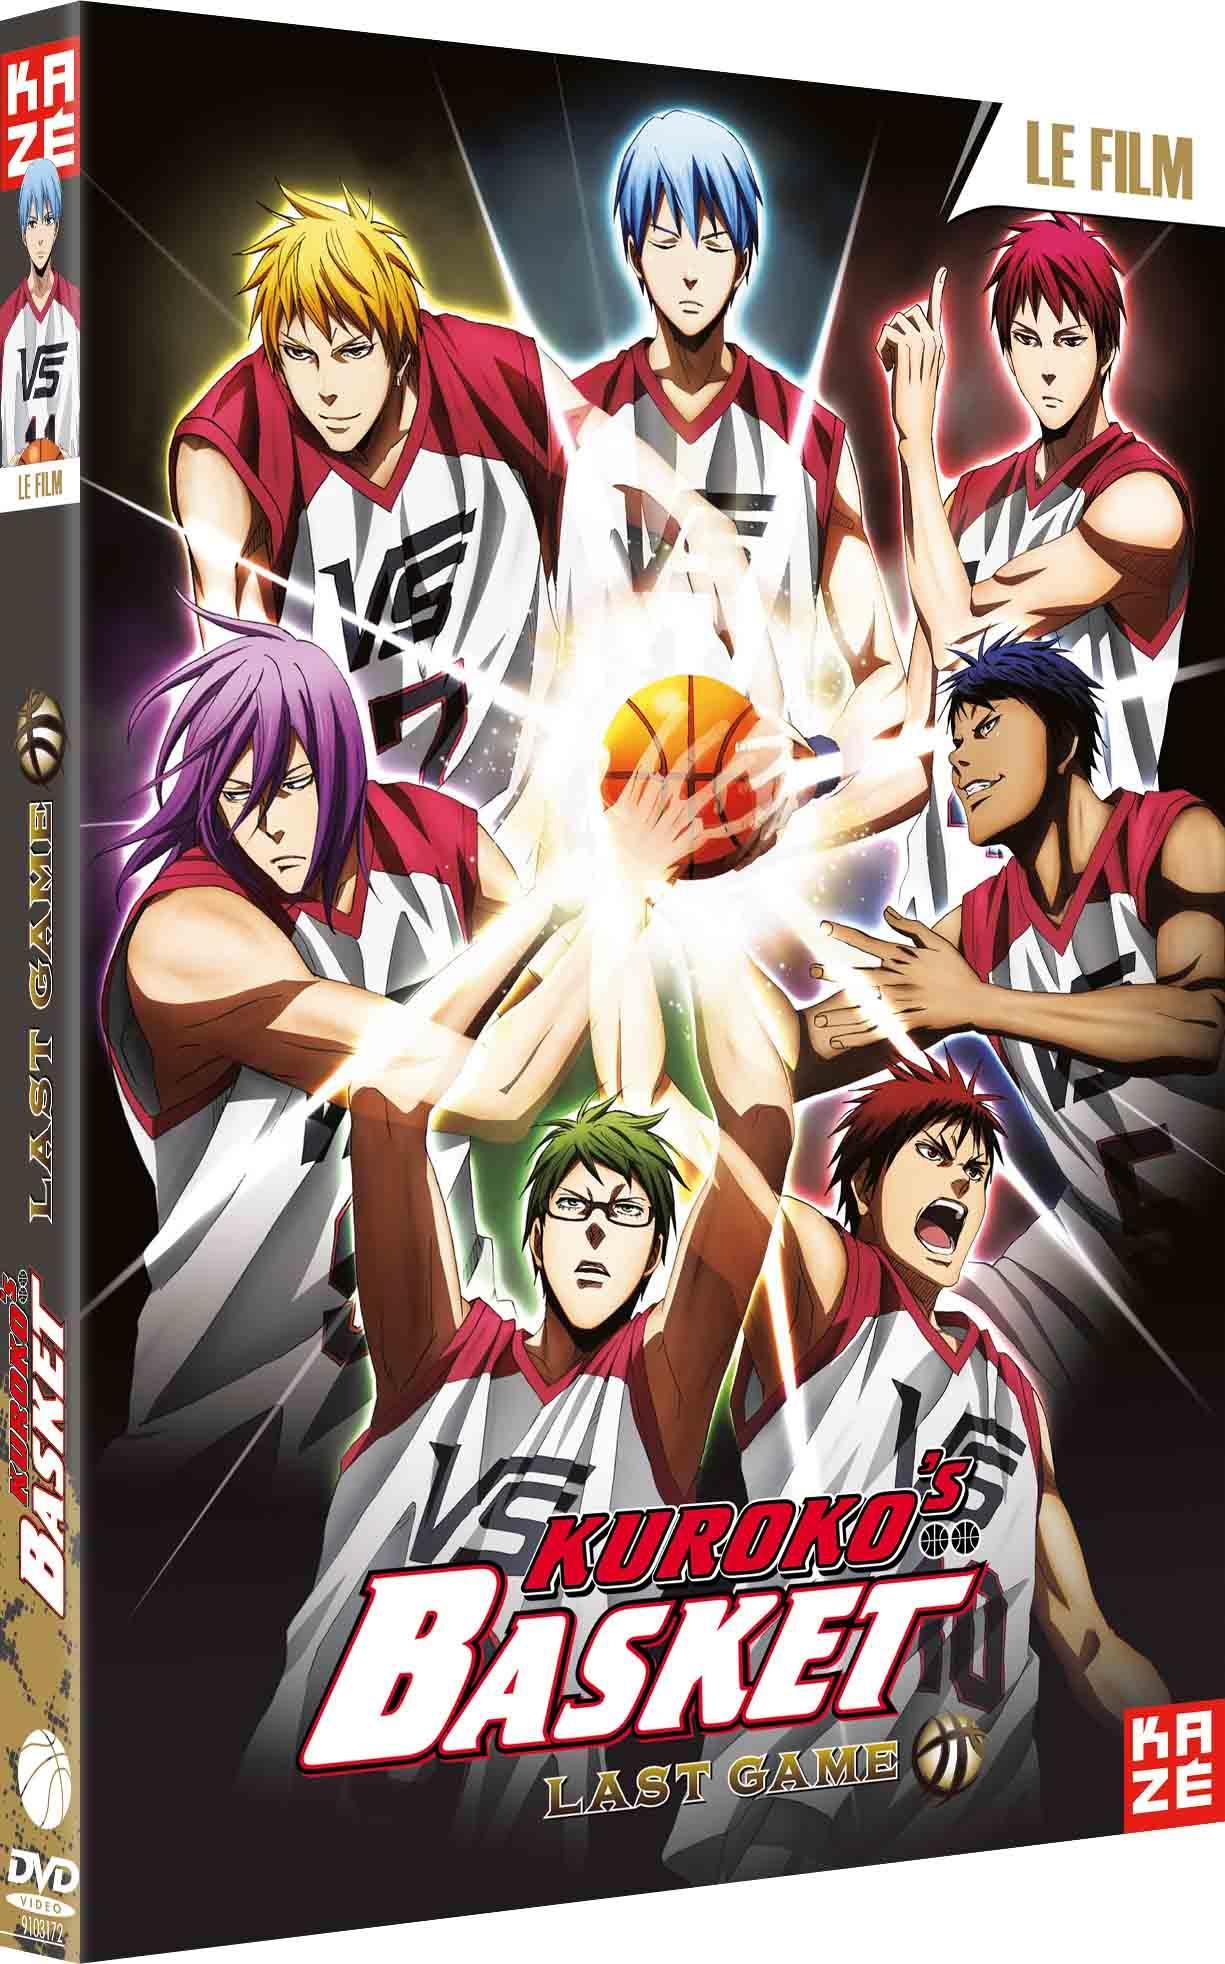 Kuroko's basket - last game - le film - dvd